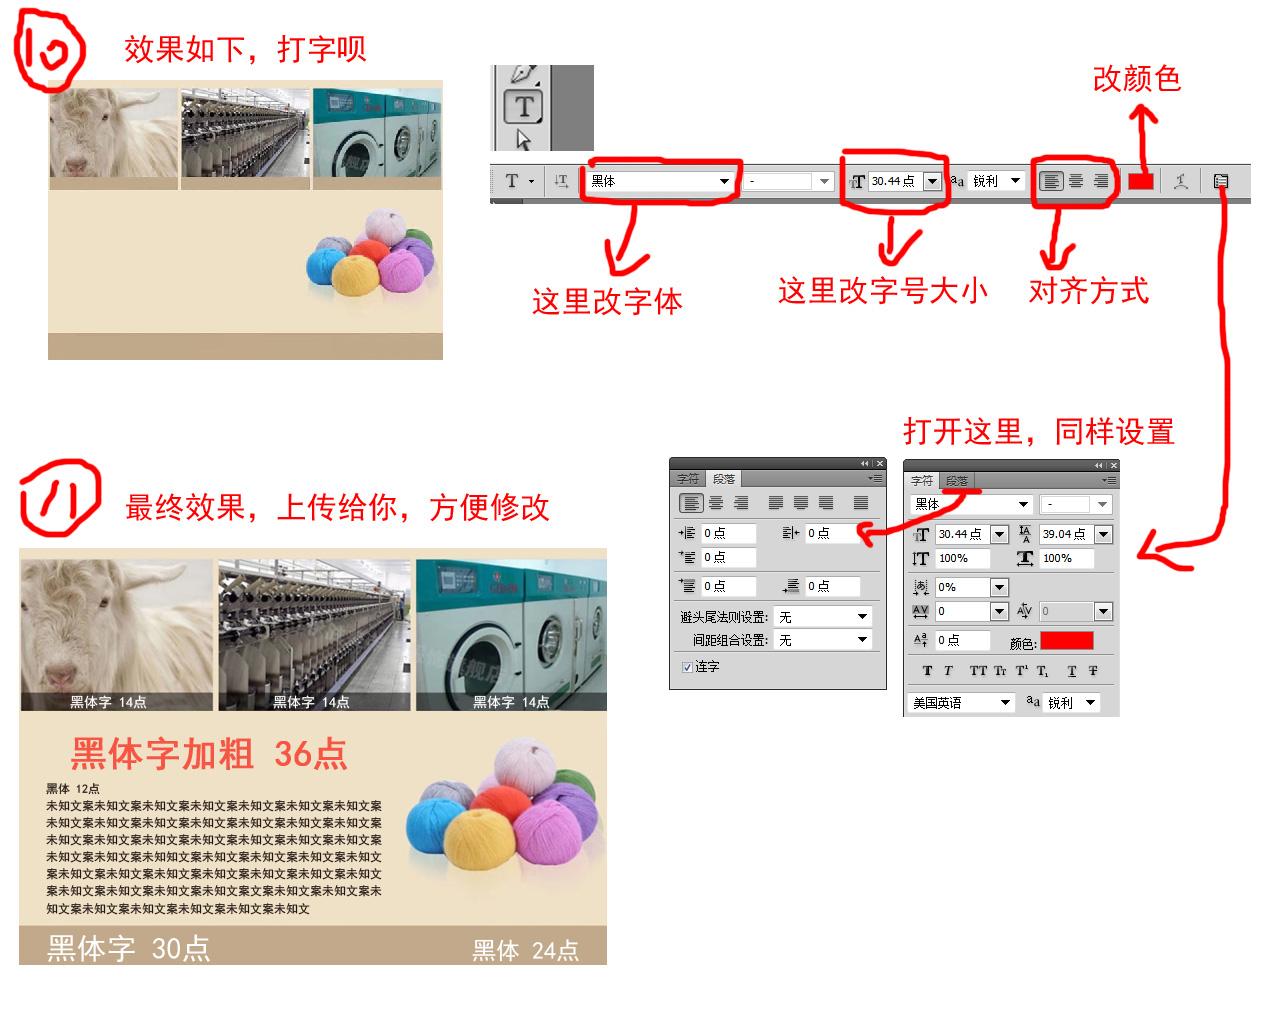 ps更改图片格式_怎么把png图片转换成psd格式。用PS储存为PSD格式用过了不行_百度知道